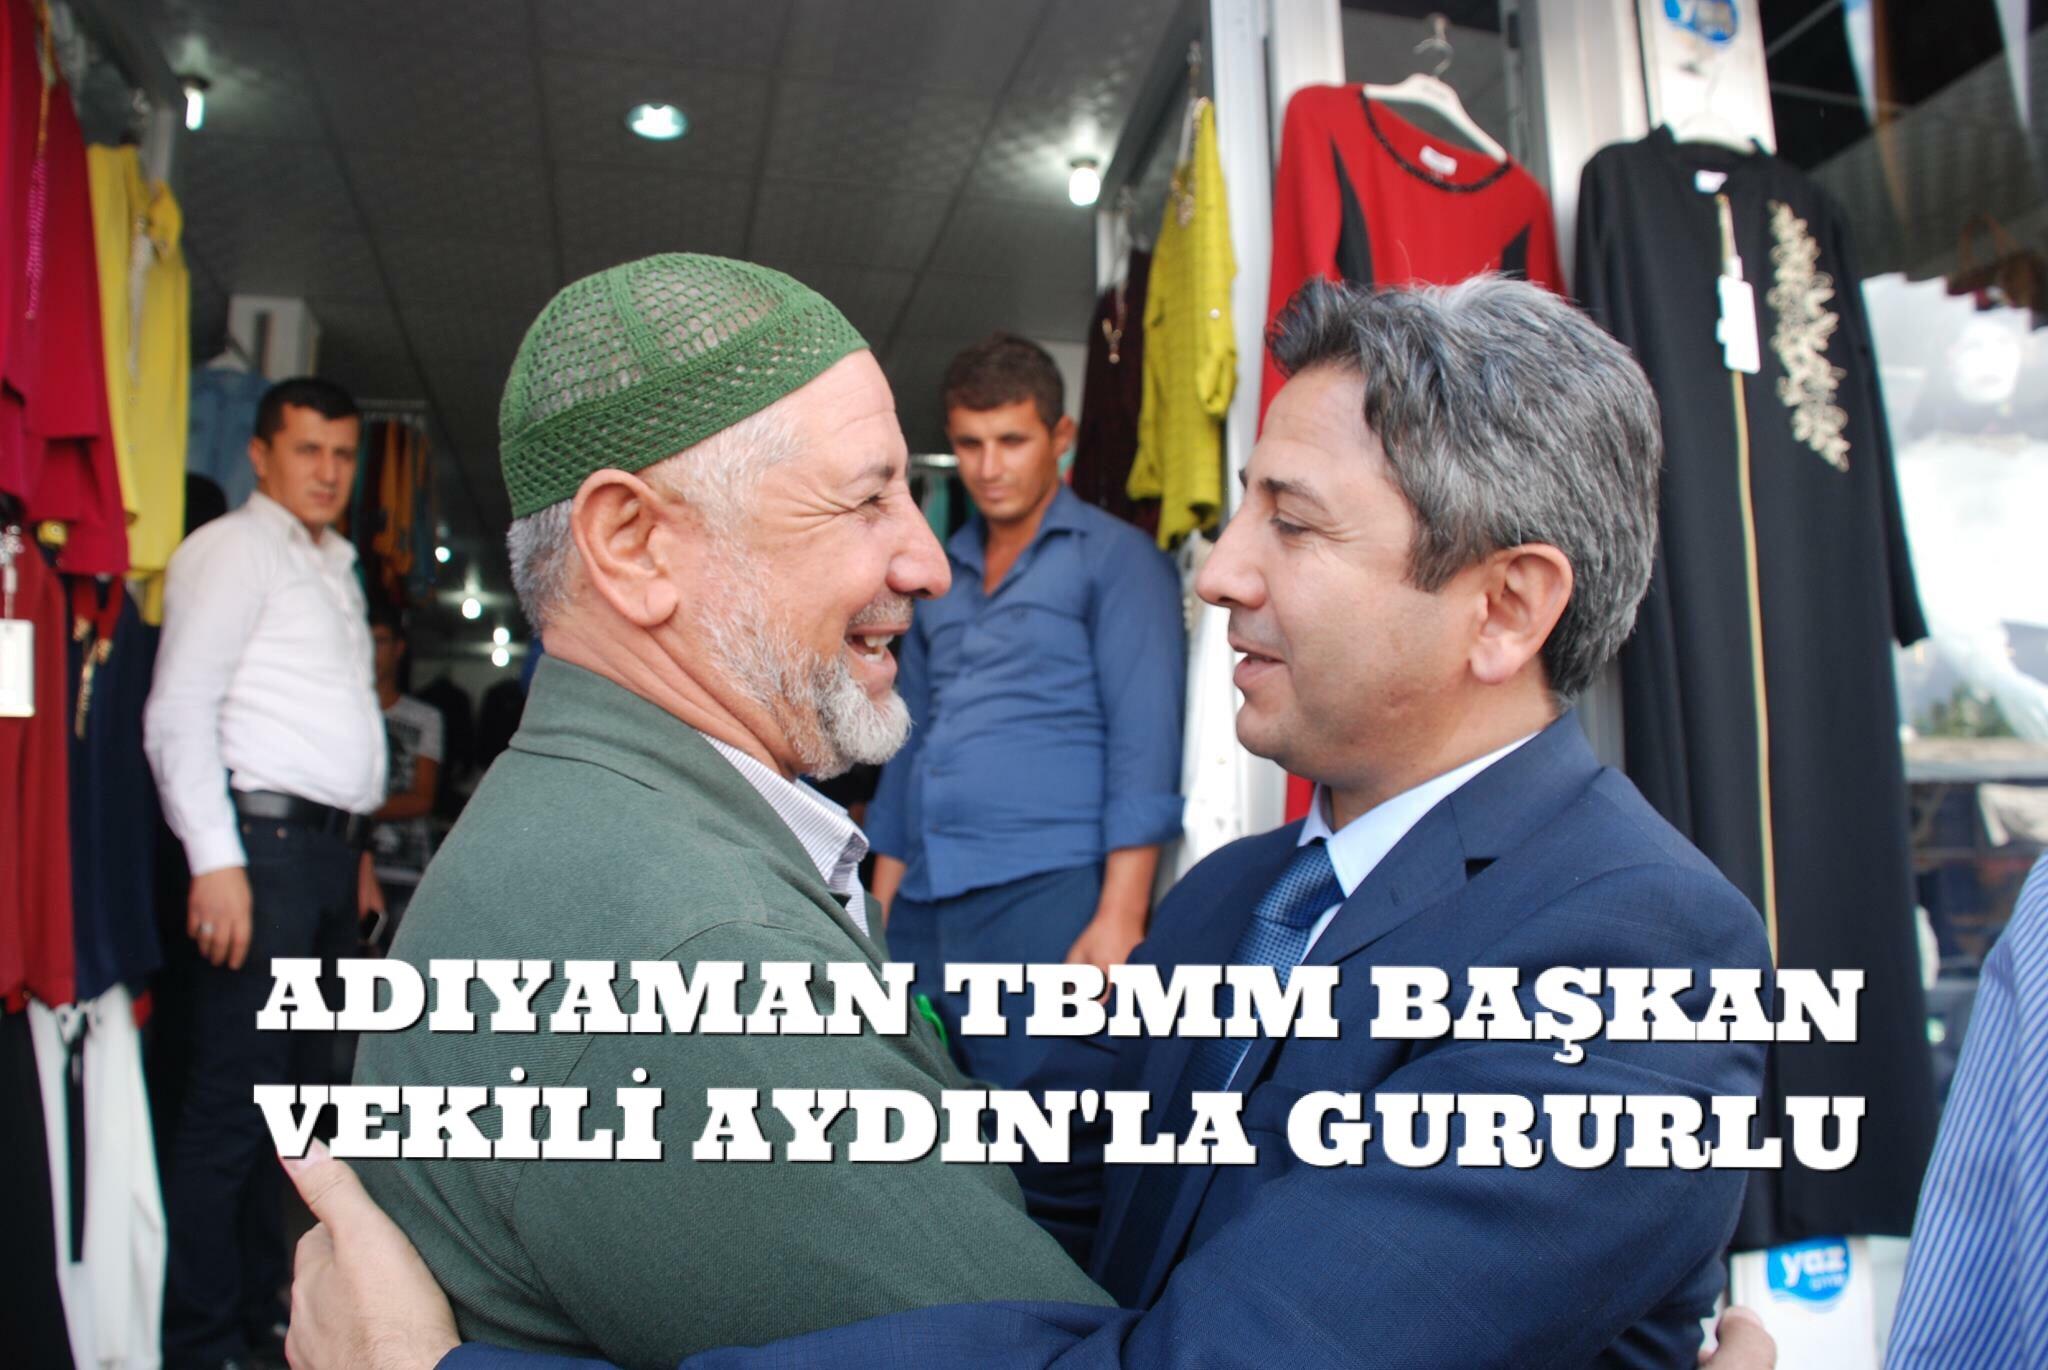 ADIYAMAN TBMM BAŞKAN VEKİLİ AHMET AYDIN'LA GURURLU